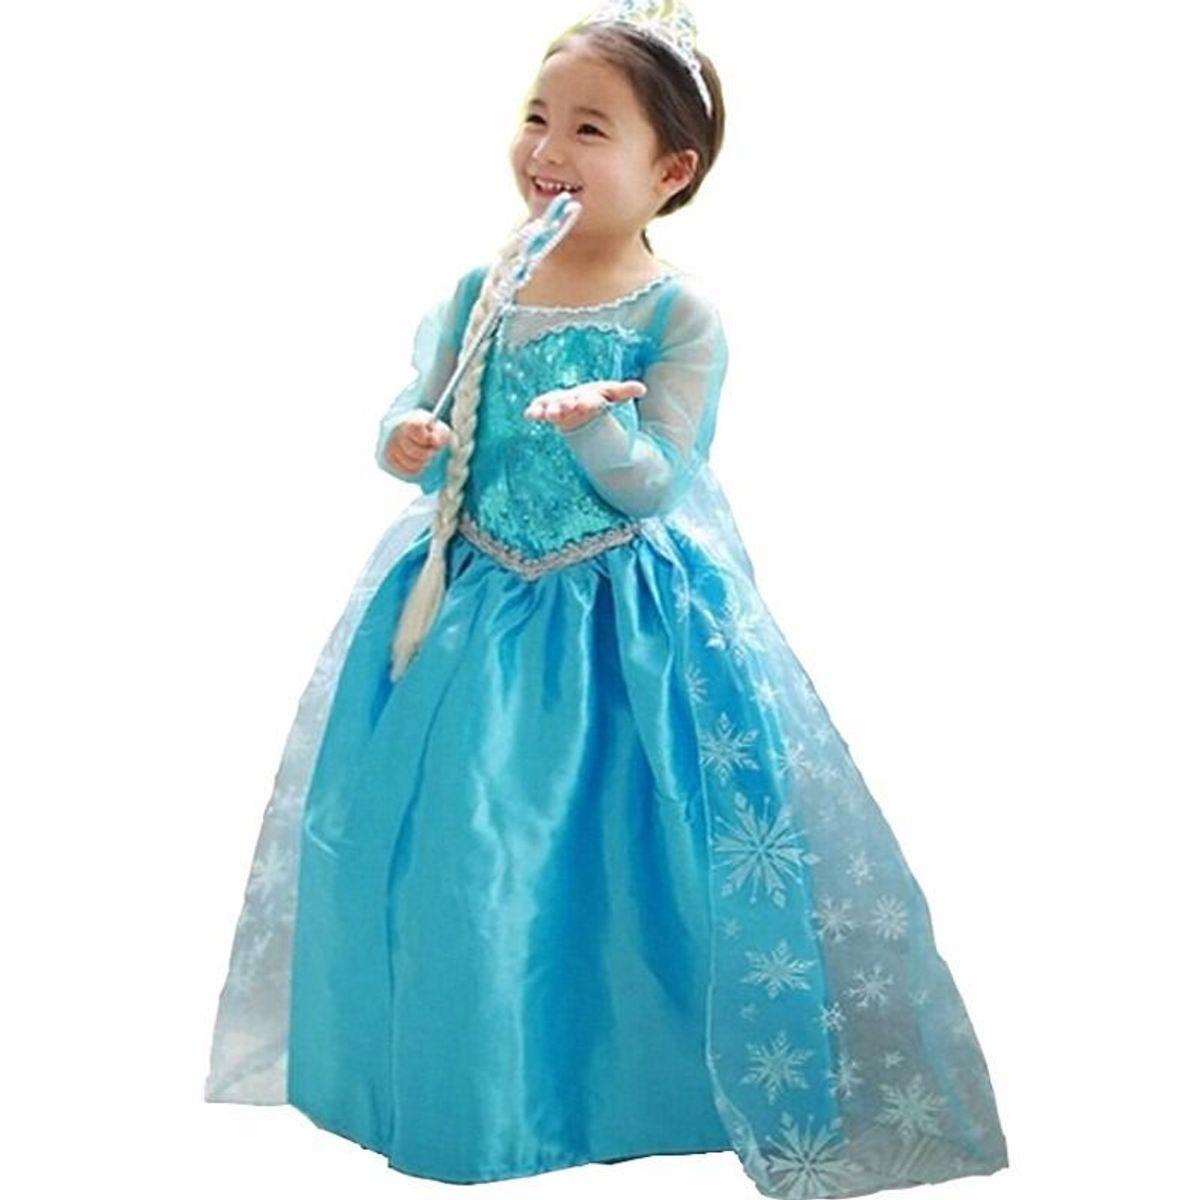 250e951c1 Vestido Princesa Elsa Anna Frozen Infantil Festa Aniversário | Roupa  Infantil para Menina Disney Nunca Usado 31738153 | enjoei